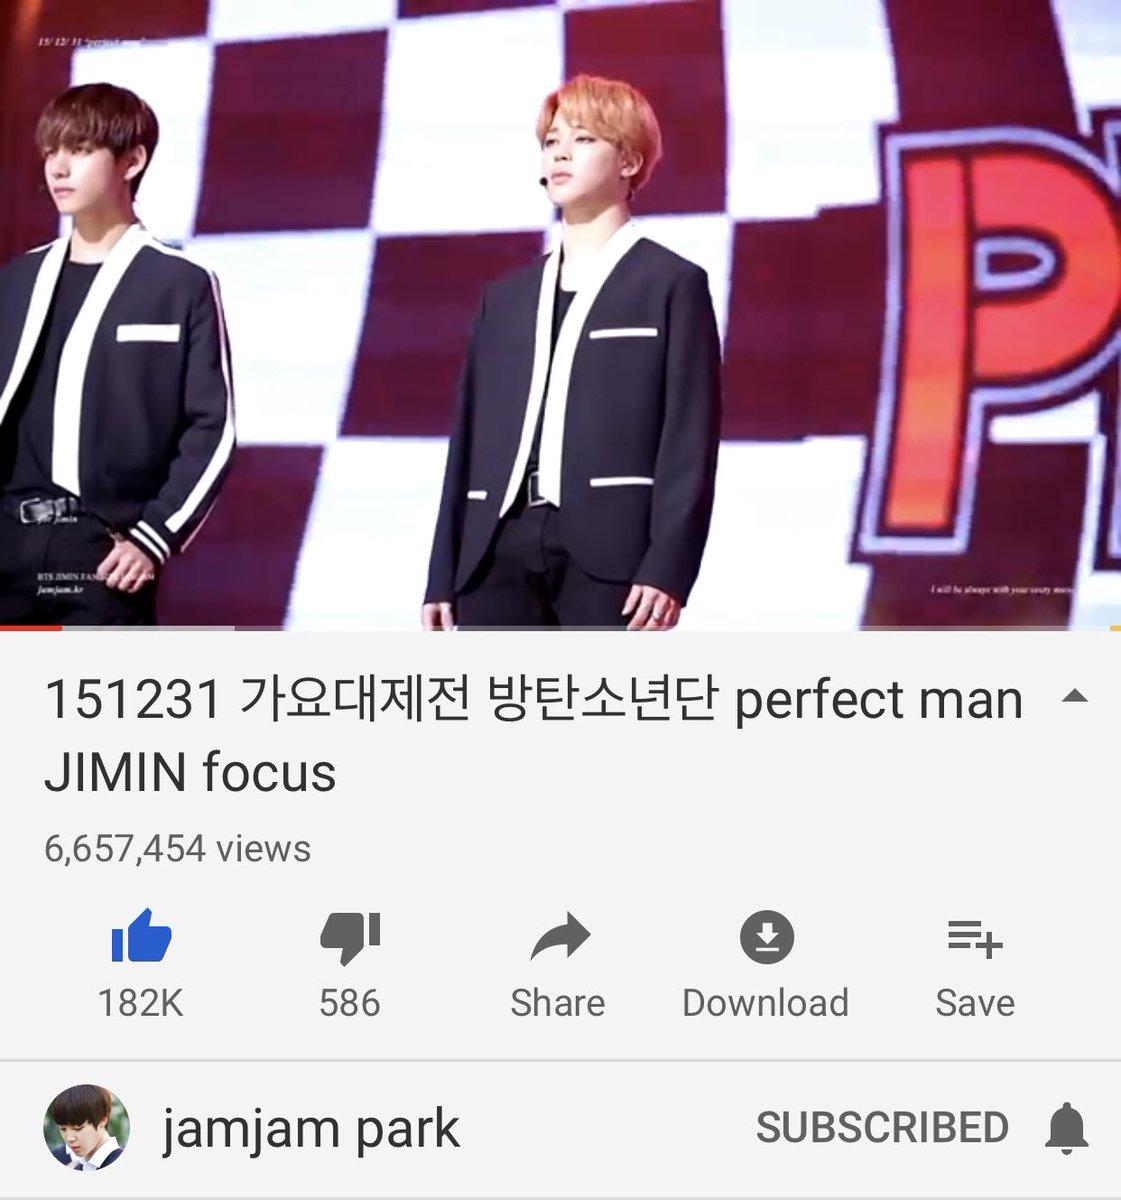 Jimin's top four focus(n/official) cams videos! 1. Perfect Man-6.65m views  https:// youtu.be/pl_39WIvMbY  &nbsp;   2. BWL-6mviews  https:// youtu.be/BSiJdqovrUs  &nbsp;   3. Nanjing NMD-4.92m views  https:// youtu.be/15ndNZW5wic  &nbsp;   4. Pied Piper-4.7m views  https:// youtu.be/cjFnL3KEGWs  &nbsp;   @BTS_twt #지민 #Jimin<br>http://pic.twitter.com/YujMKZA7xH